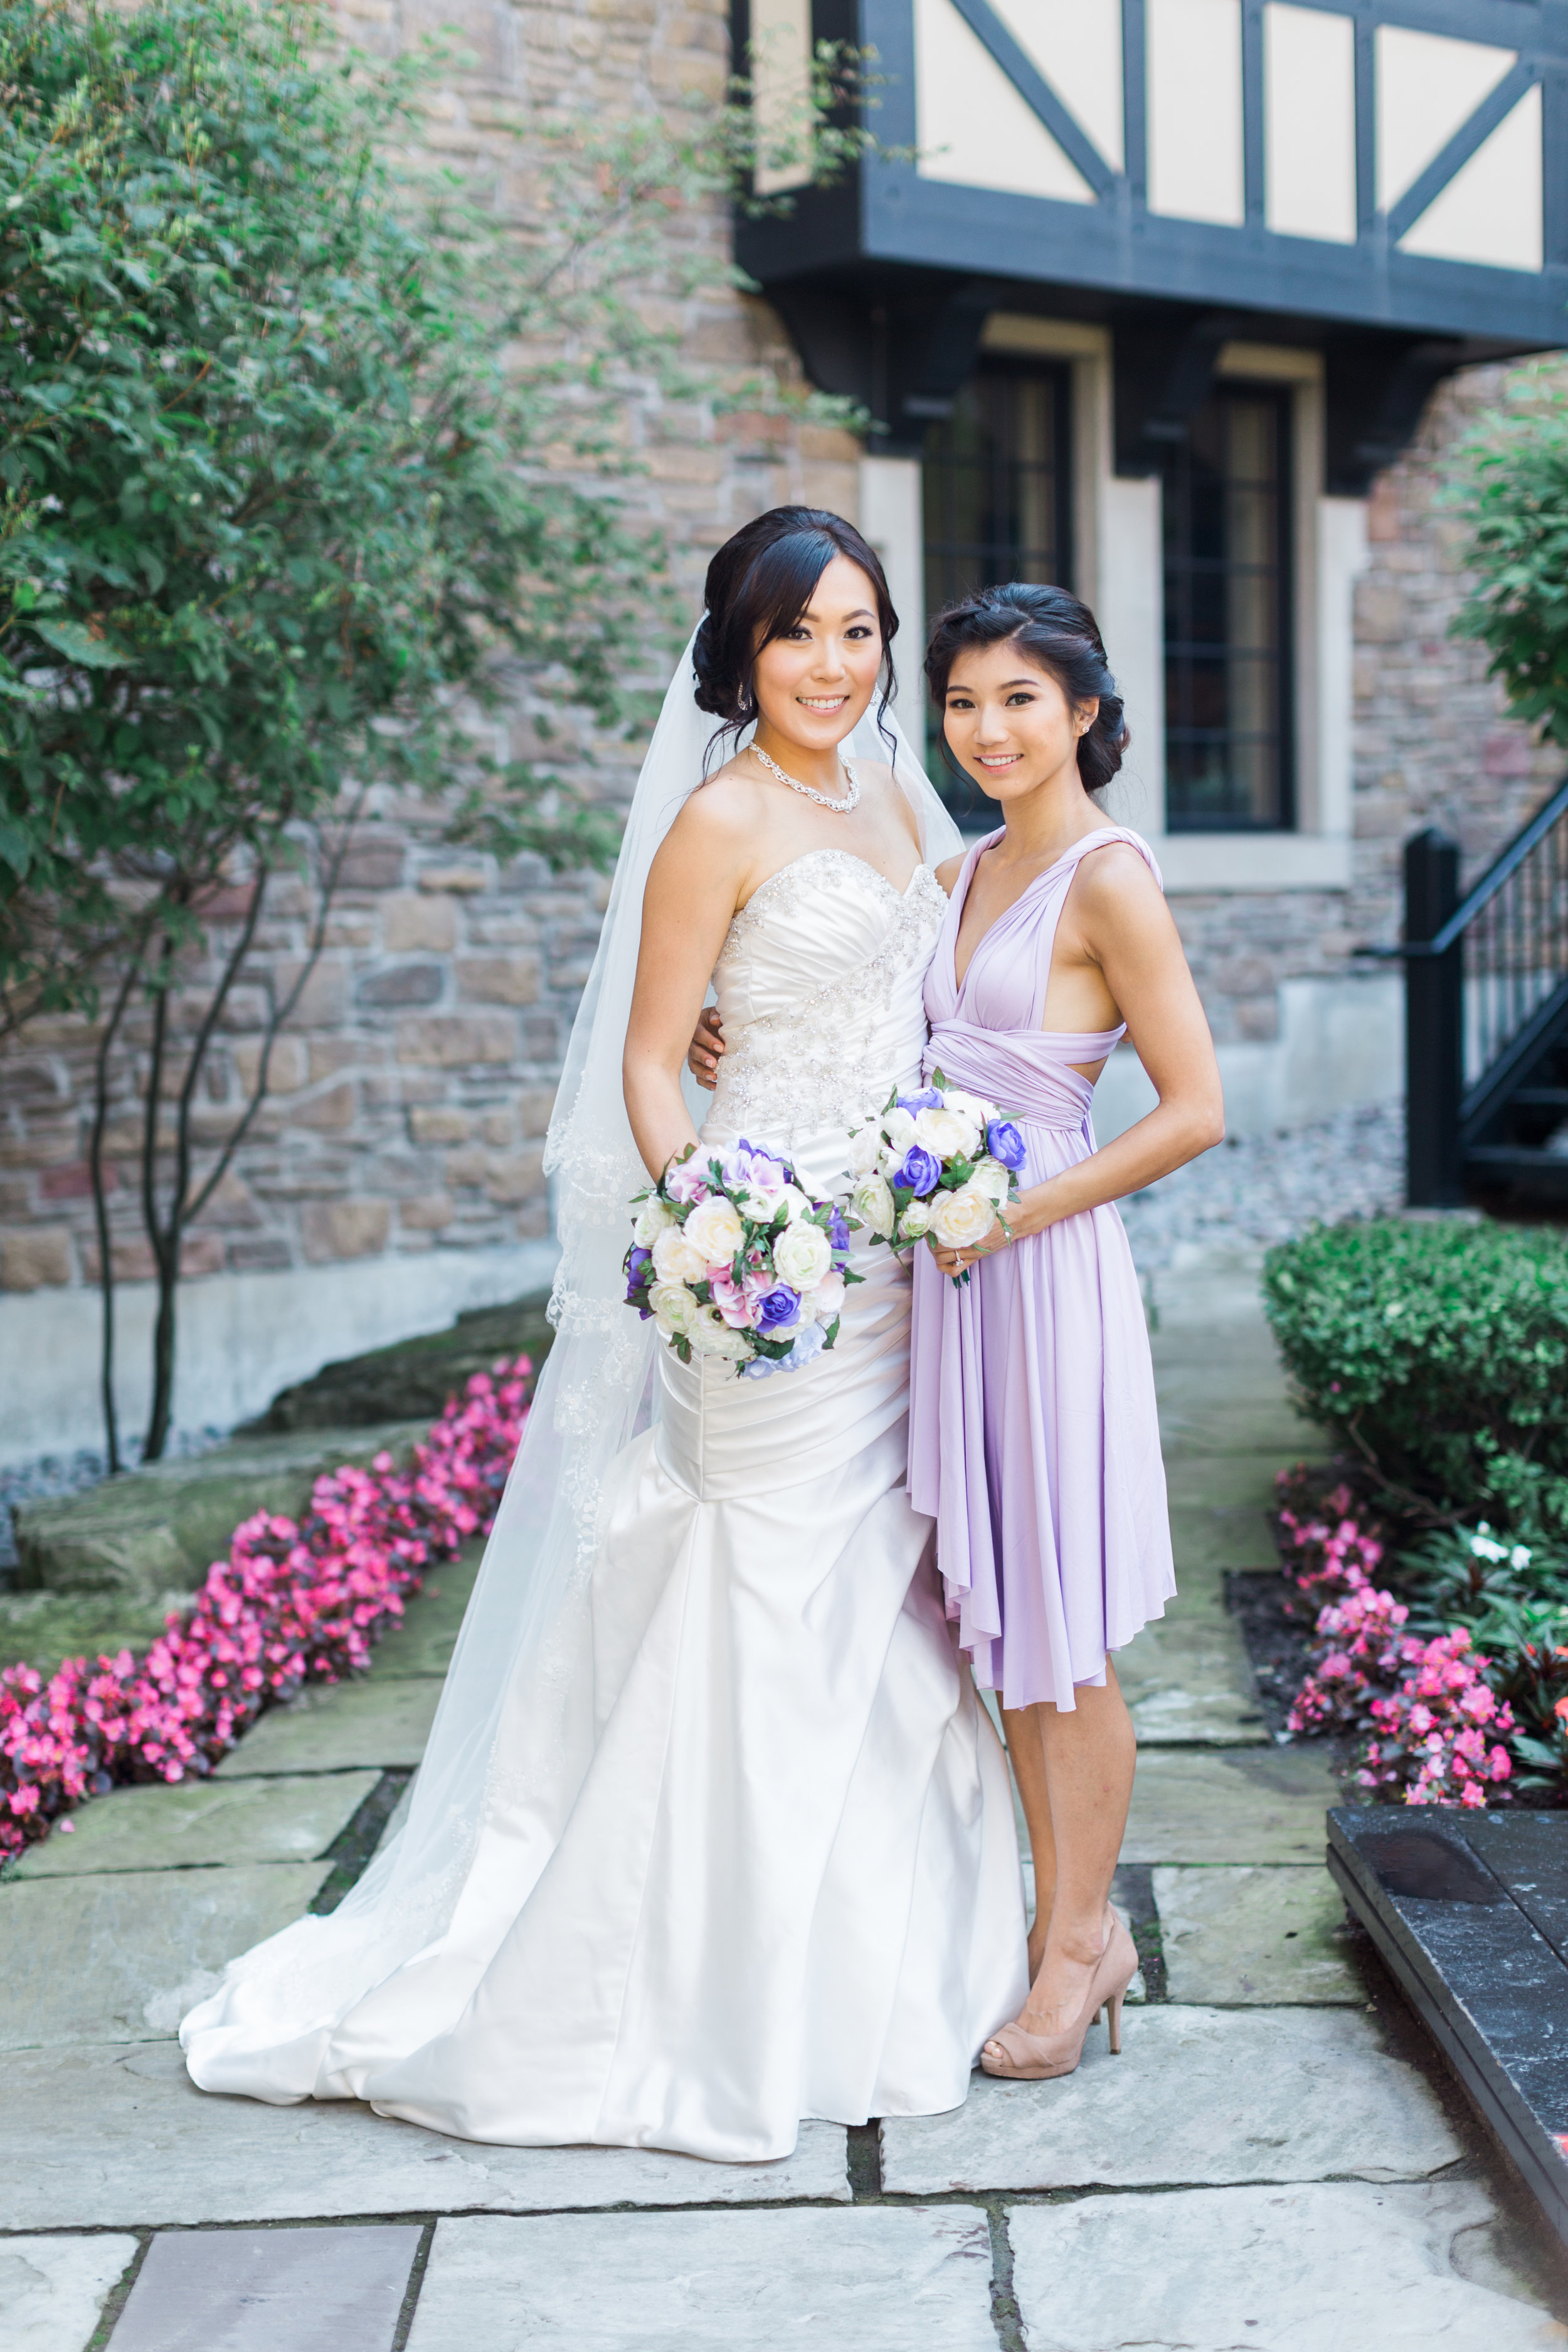 Toronto Fine Art Photographer - Old Mill Wedding - Bridesmaids Photos-25.jpg